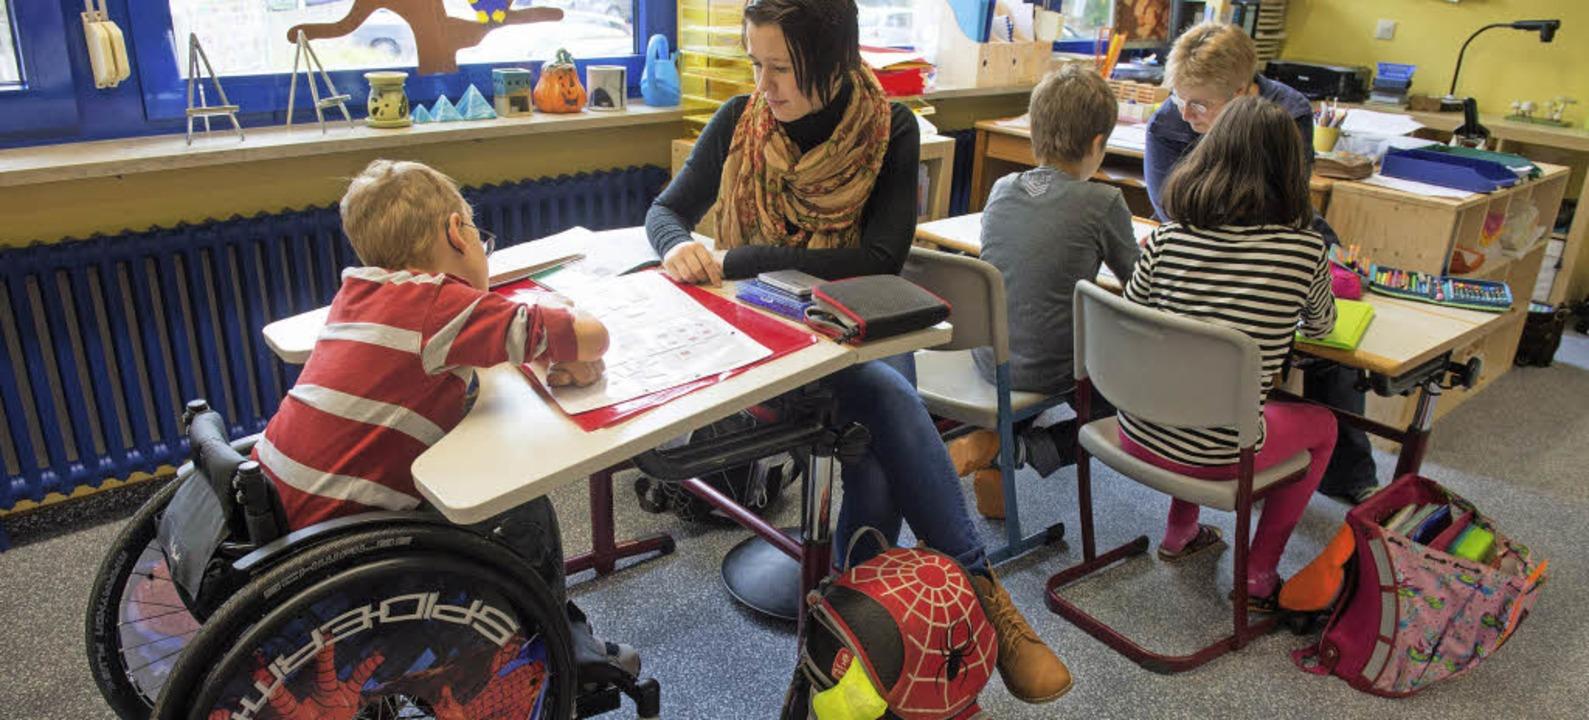 Inklusion ist besonders in der Schule wichtig.   | Foto: dpa